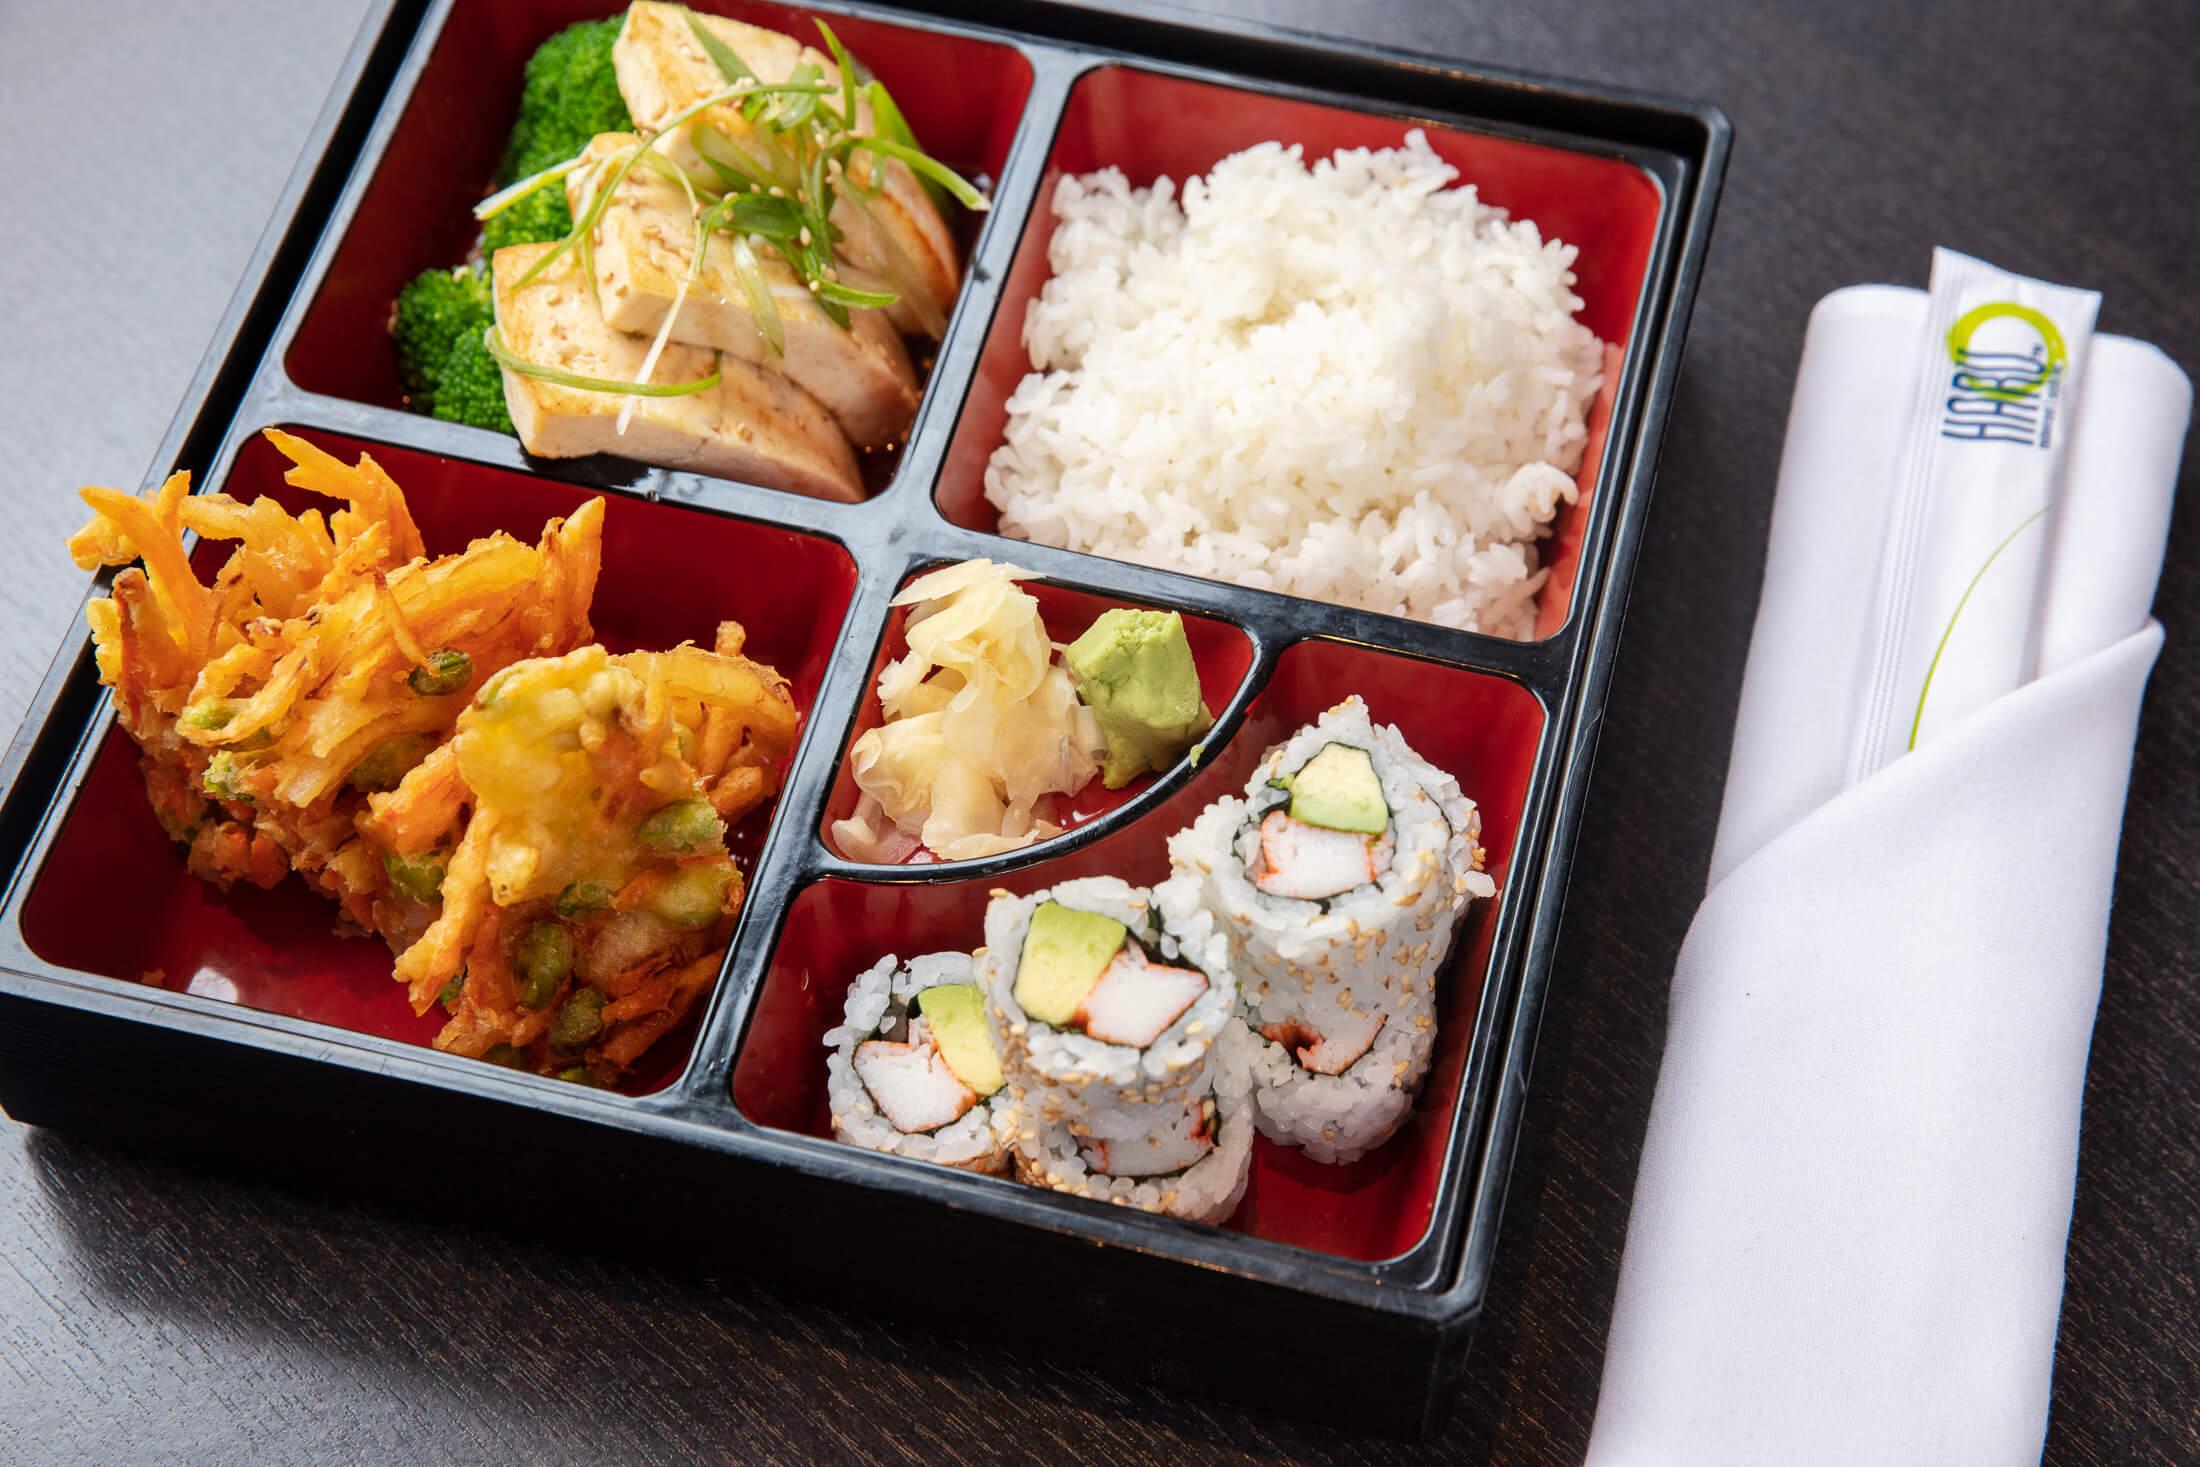 Tofu Steak Bento Box lunch